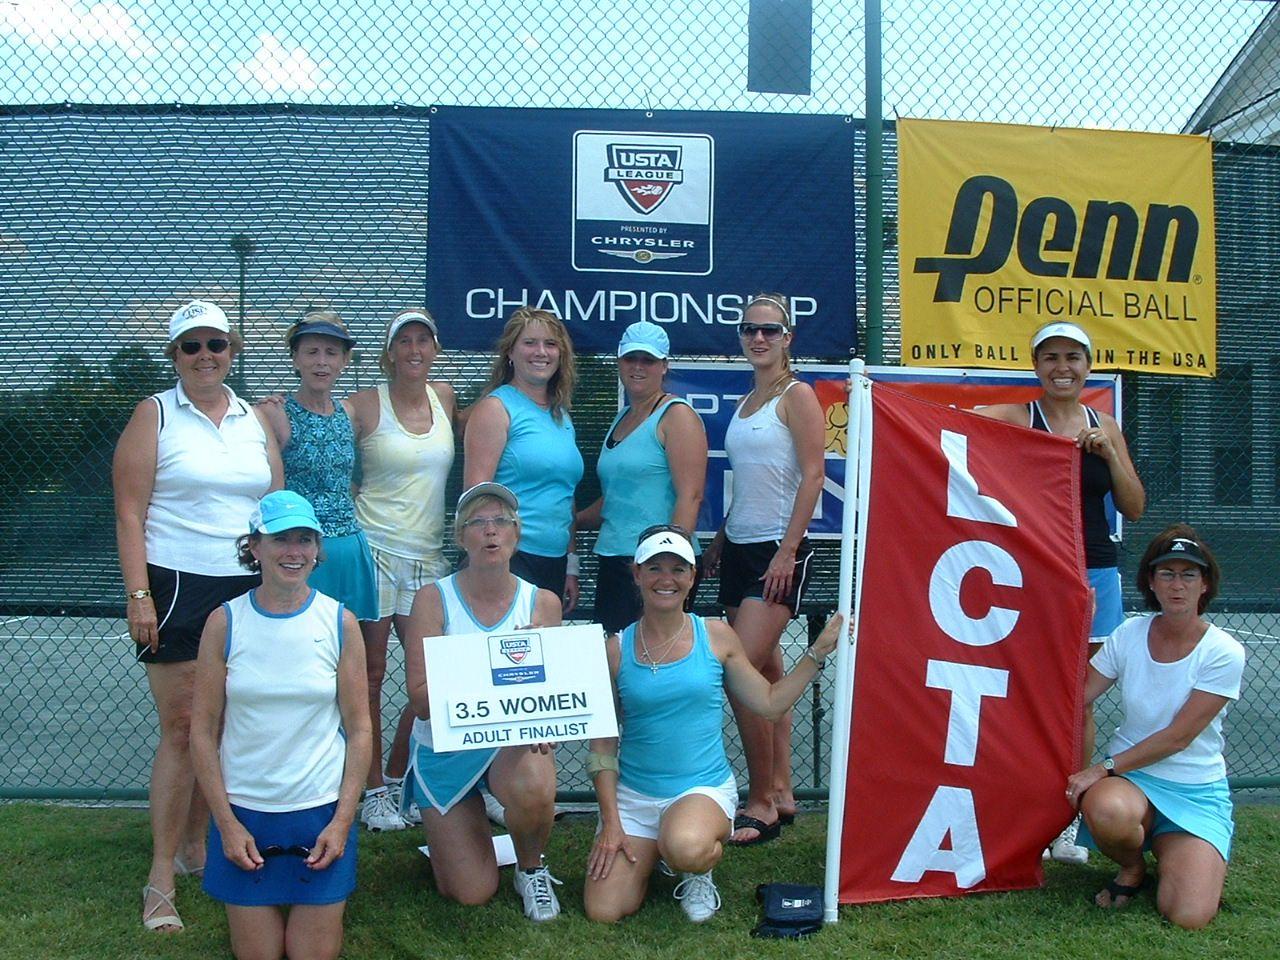 2007 Adult Champs 3.5 W Finalist